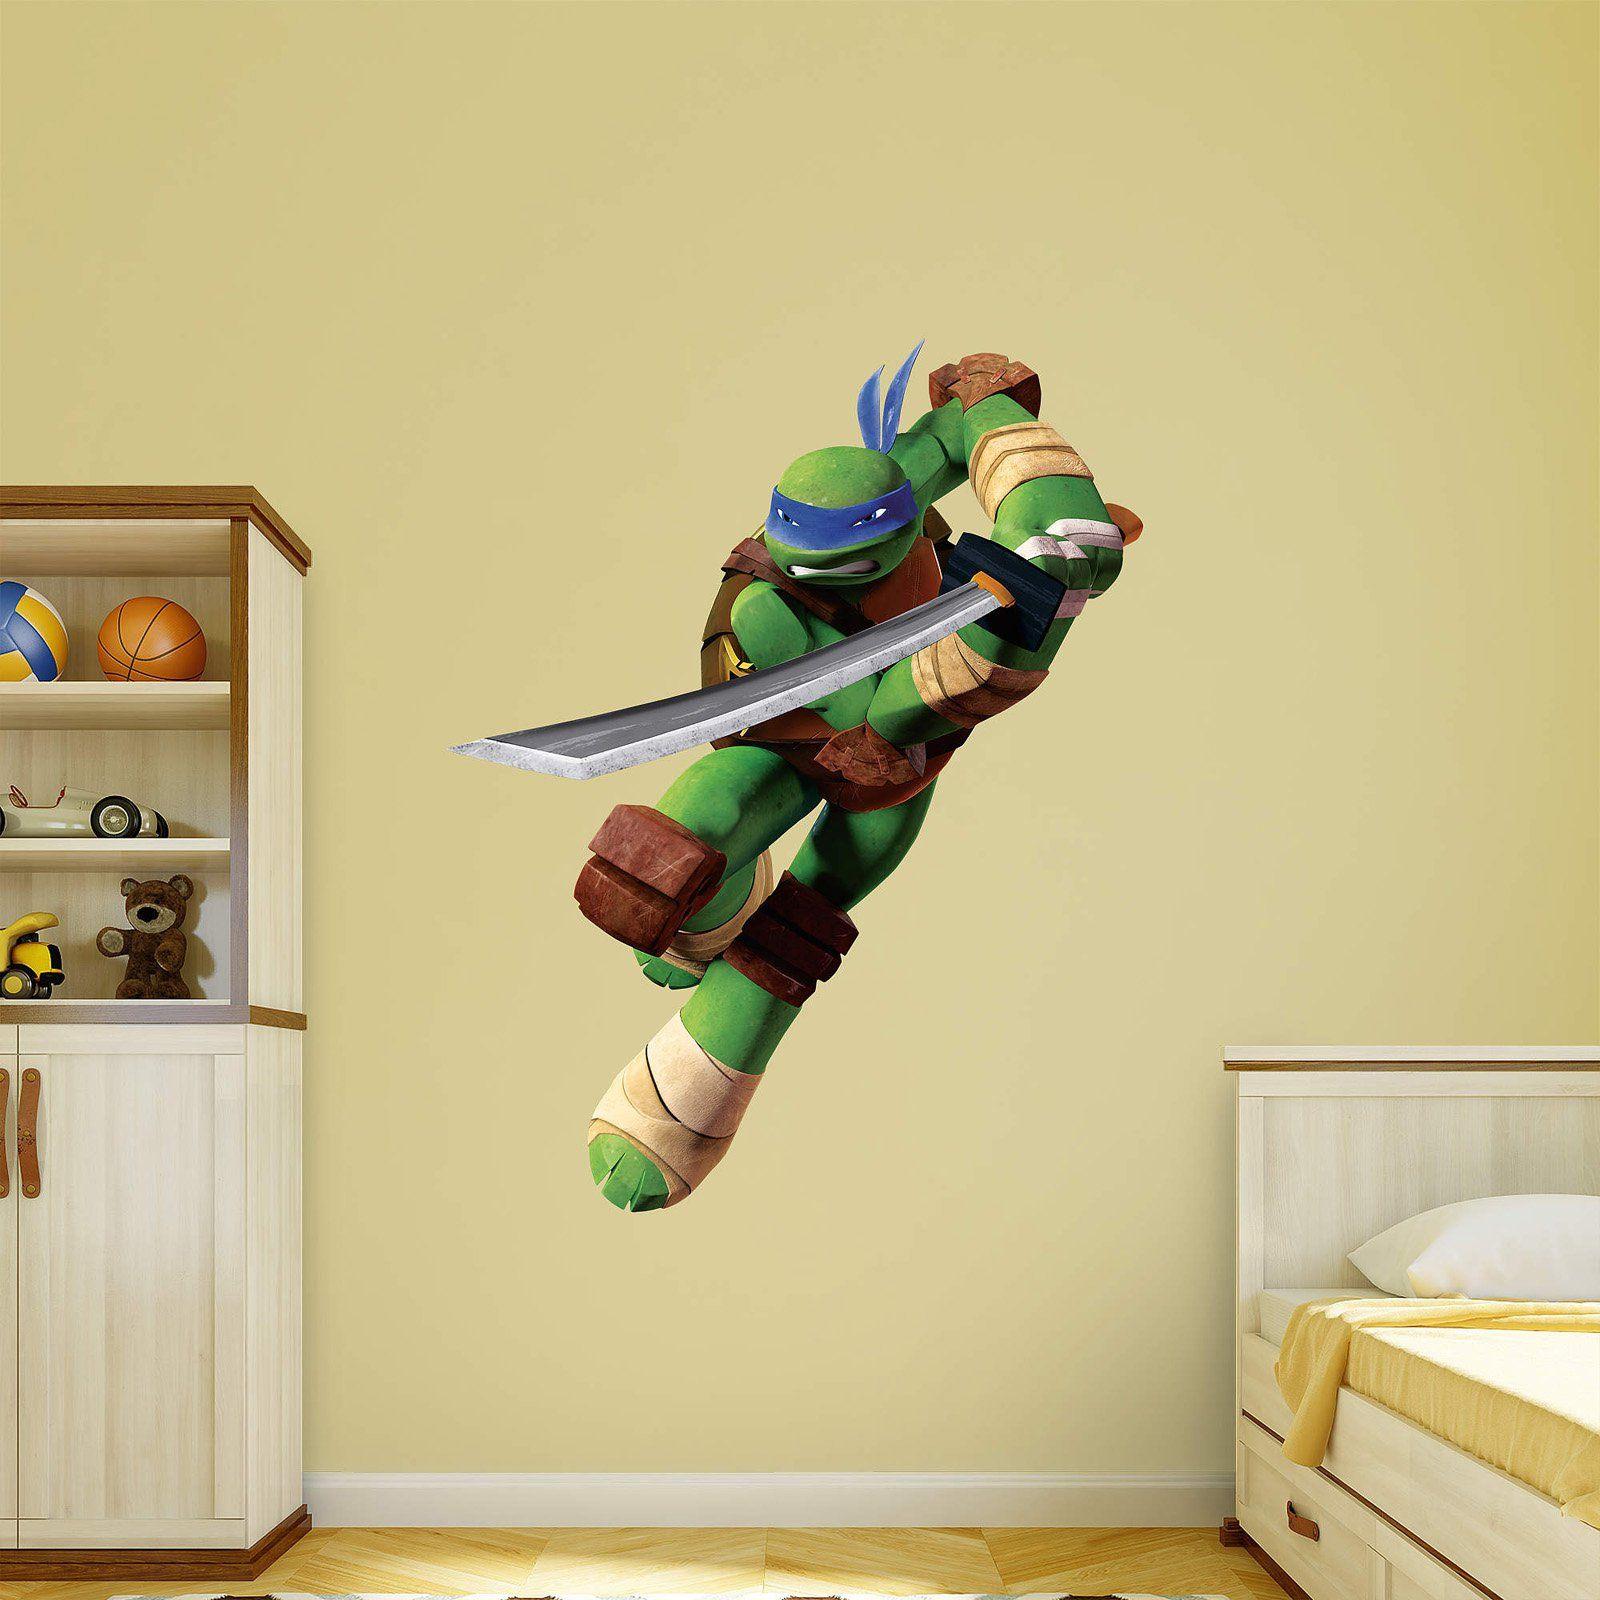 Amazon Com 9 Inch Donatello Donnie Leonardo Leo Michelangelo Mikey Raphael Raph Turtle Tmnt Teenage Mutant Ninja Turtles Removable Peel Self Stick Wall Decal Sticker Art Kids Decor Boys Room 9 1 2 X